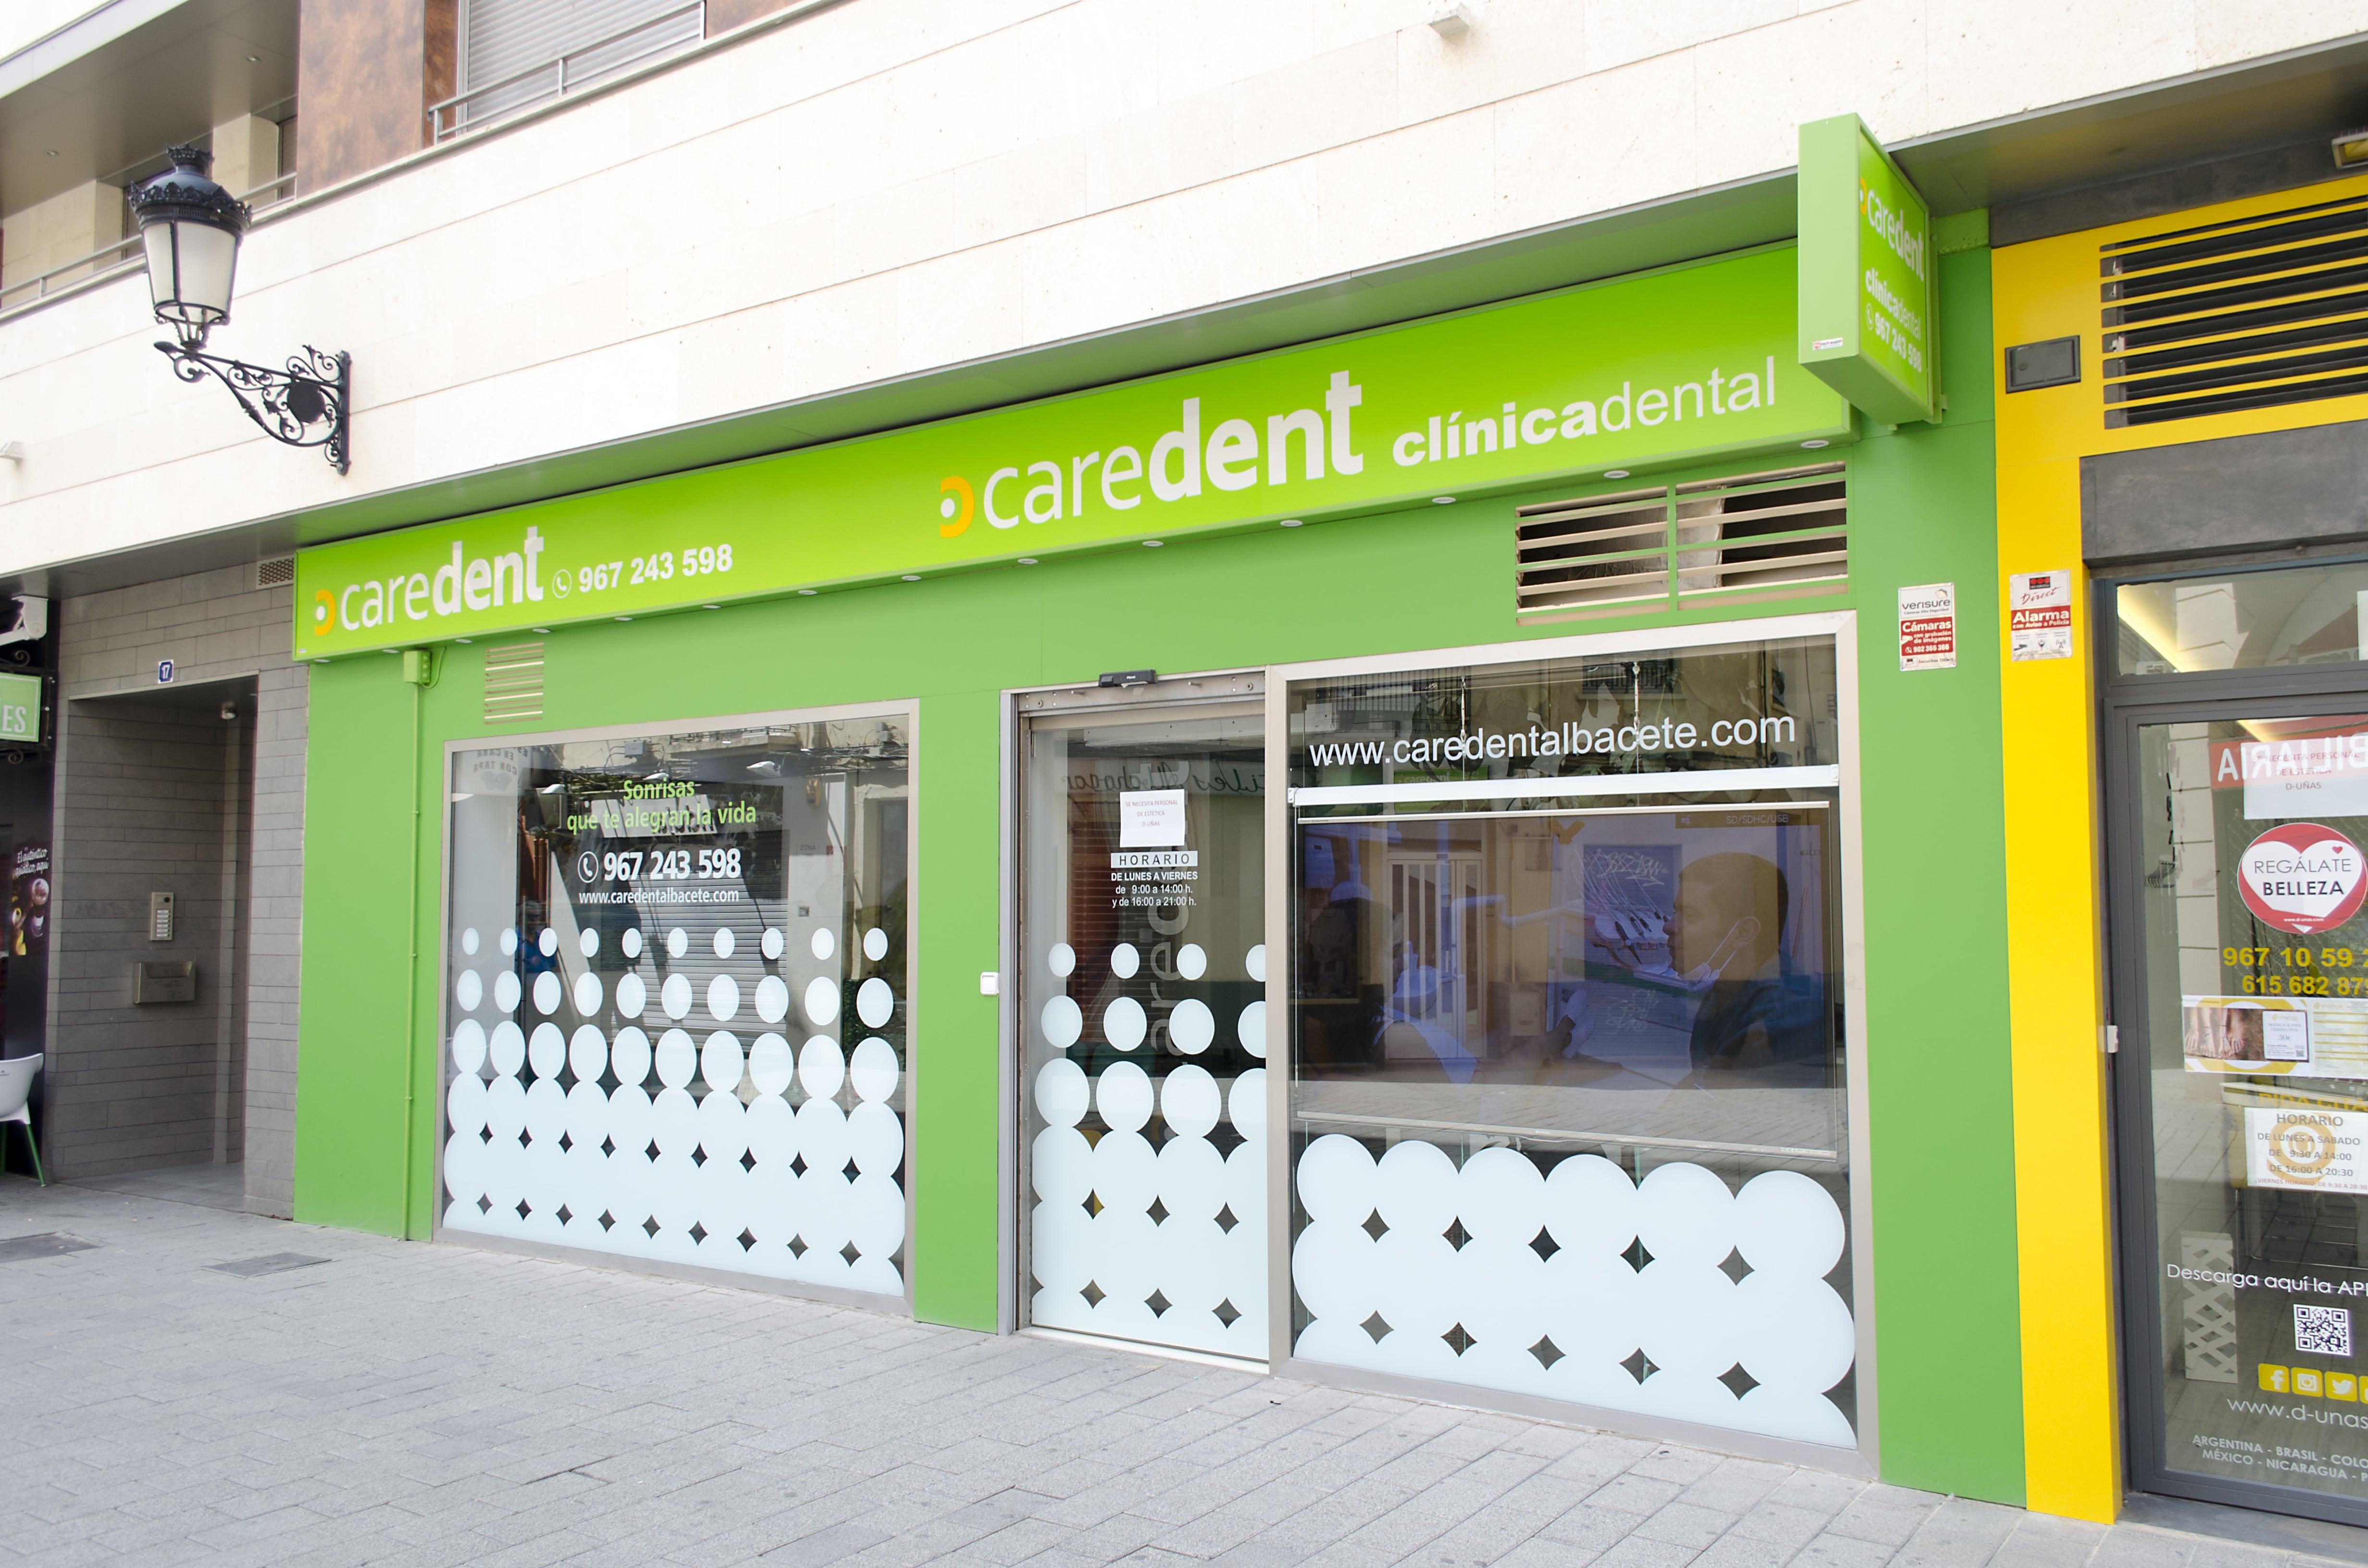 Caredent Albacete clínica dental - fachada